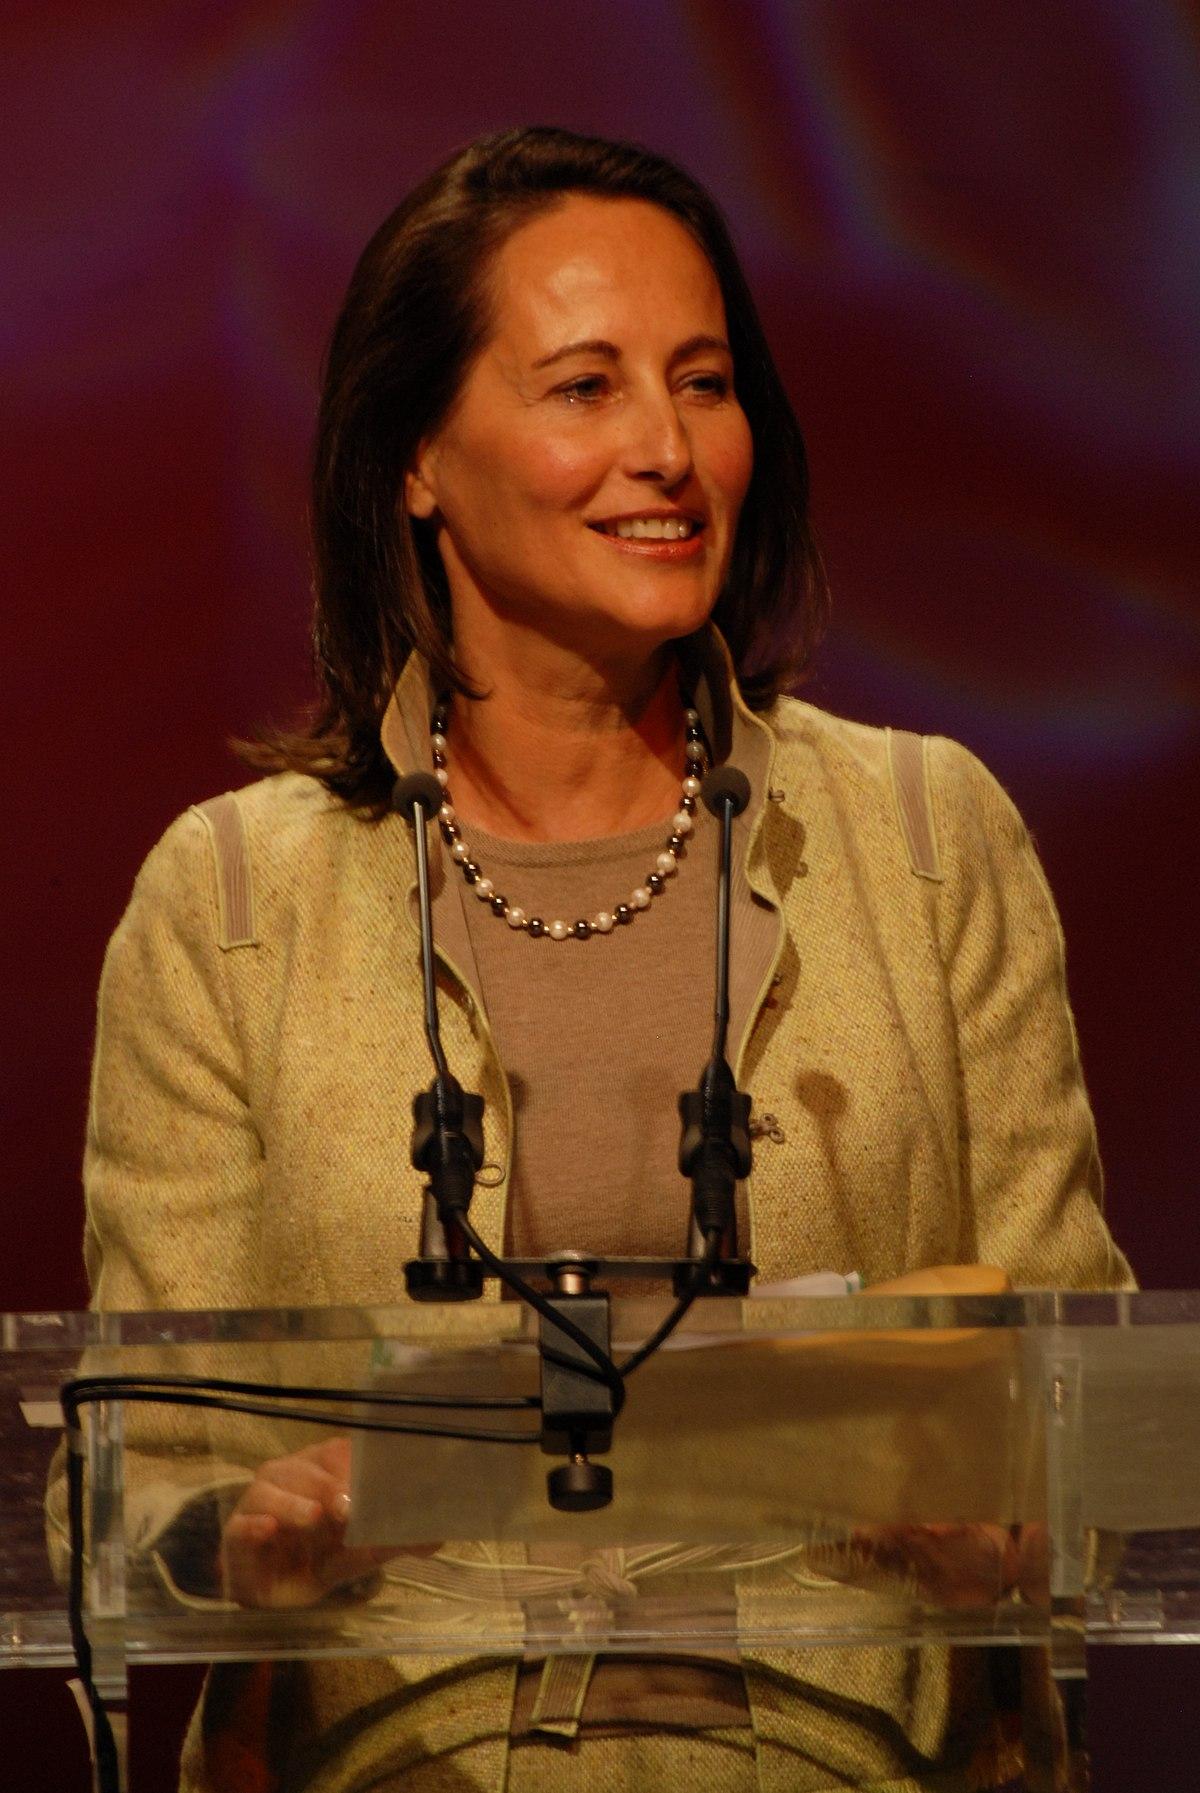 Ségolène Royal - Wikimedia Commons